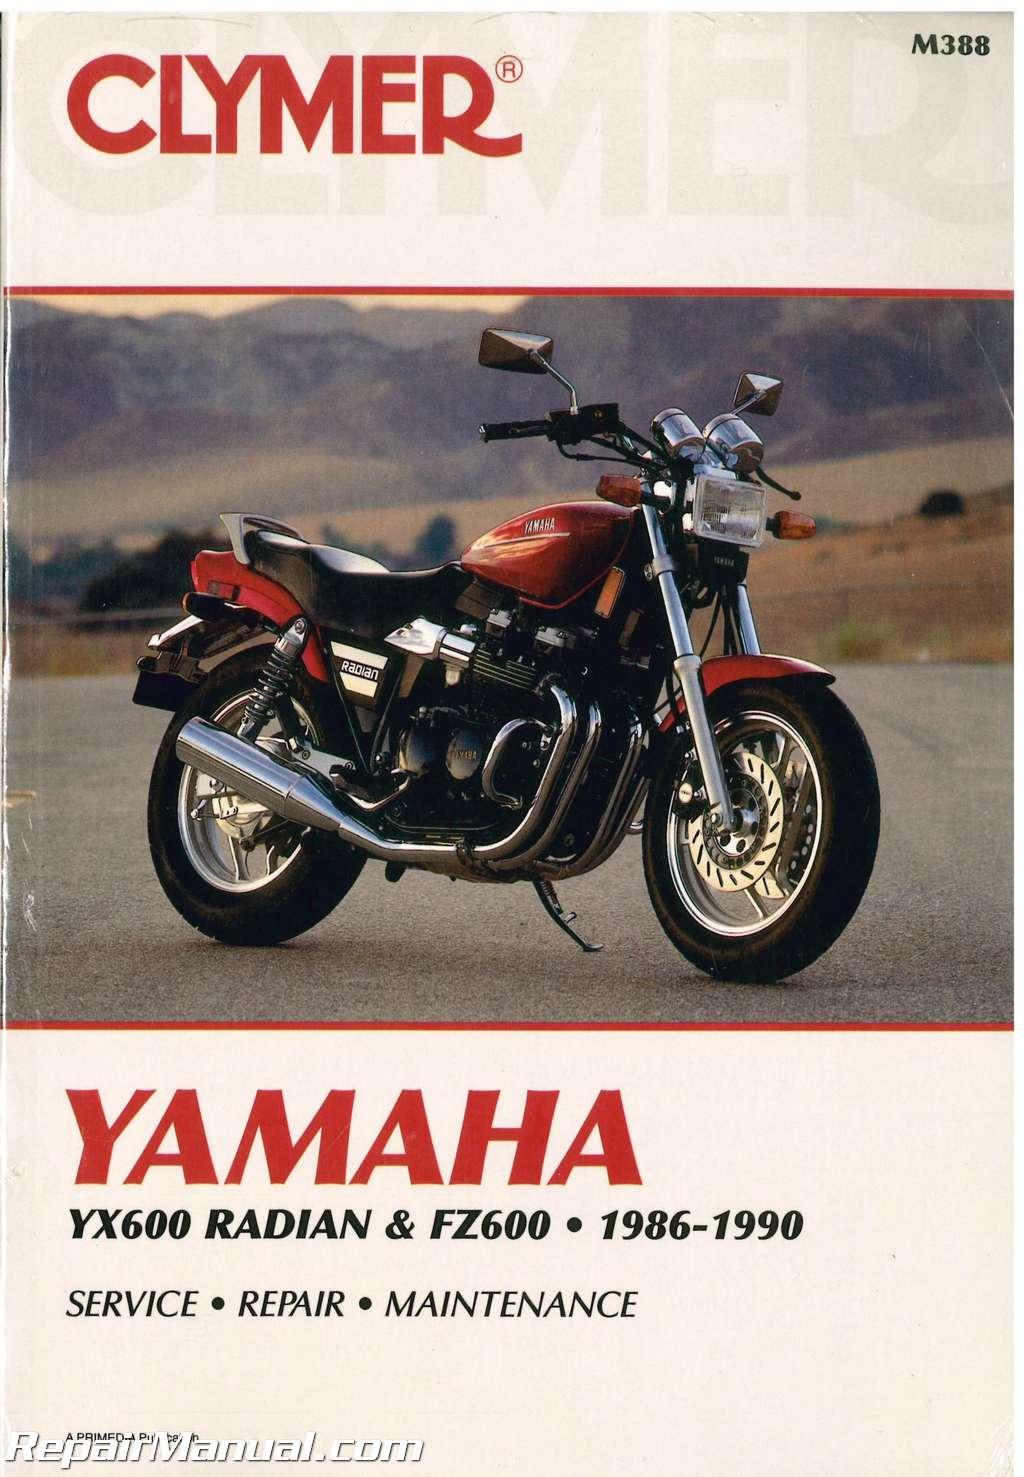 Clymer Yamaha Yx600 Radian Fz600 1986 1990 Motorcycle